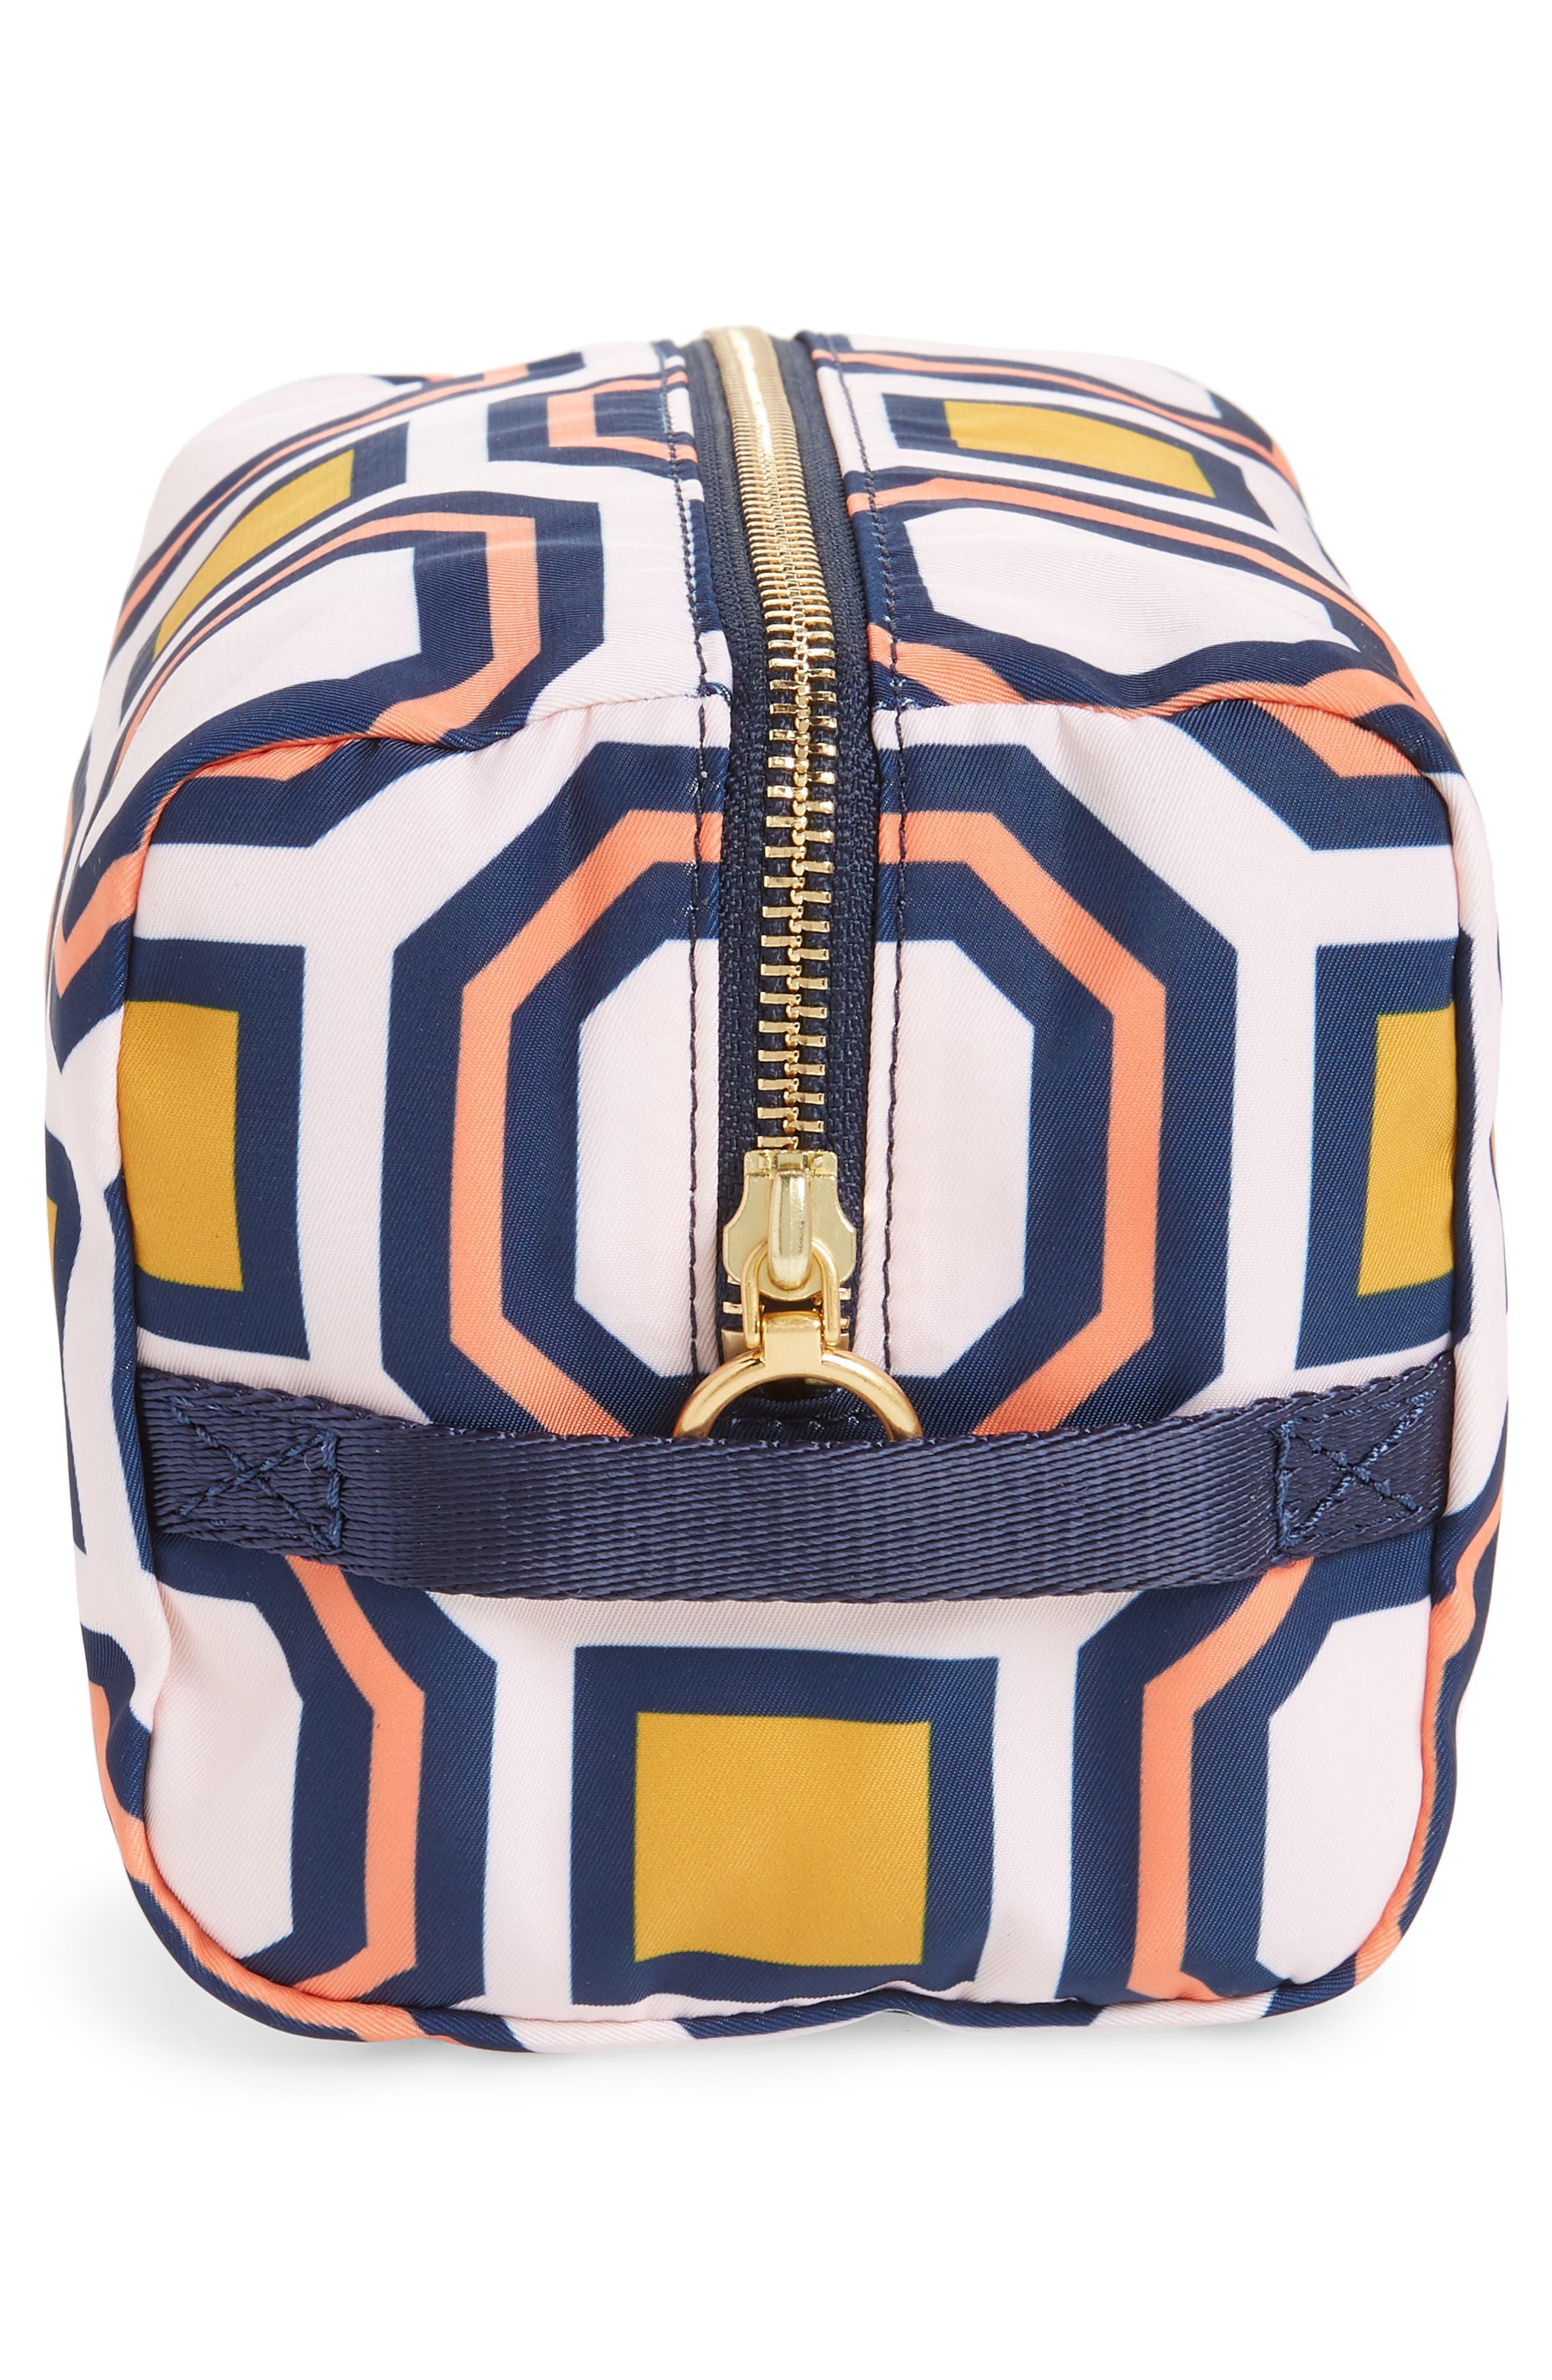 Octagon Print Medium Cosmetics Bag,                             Alternate thumbnail 4, color,